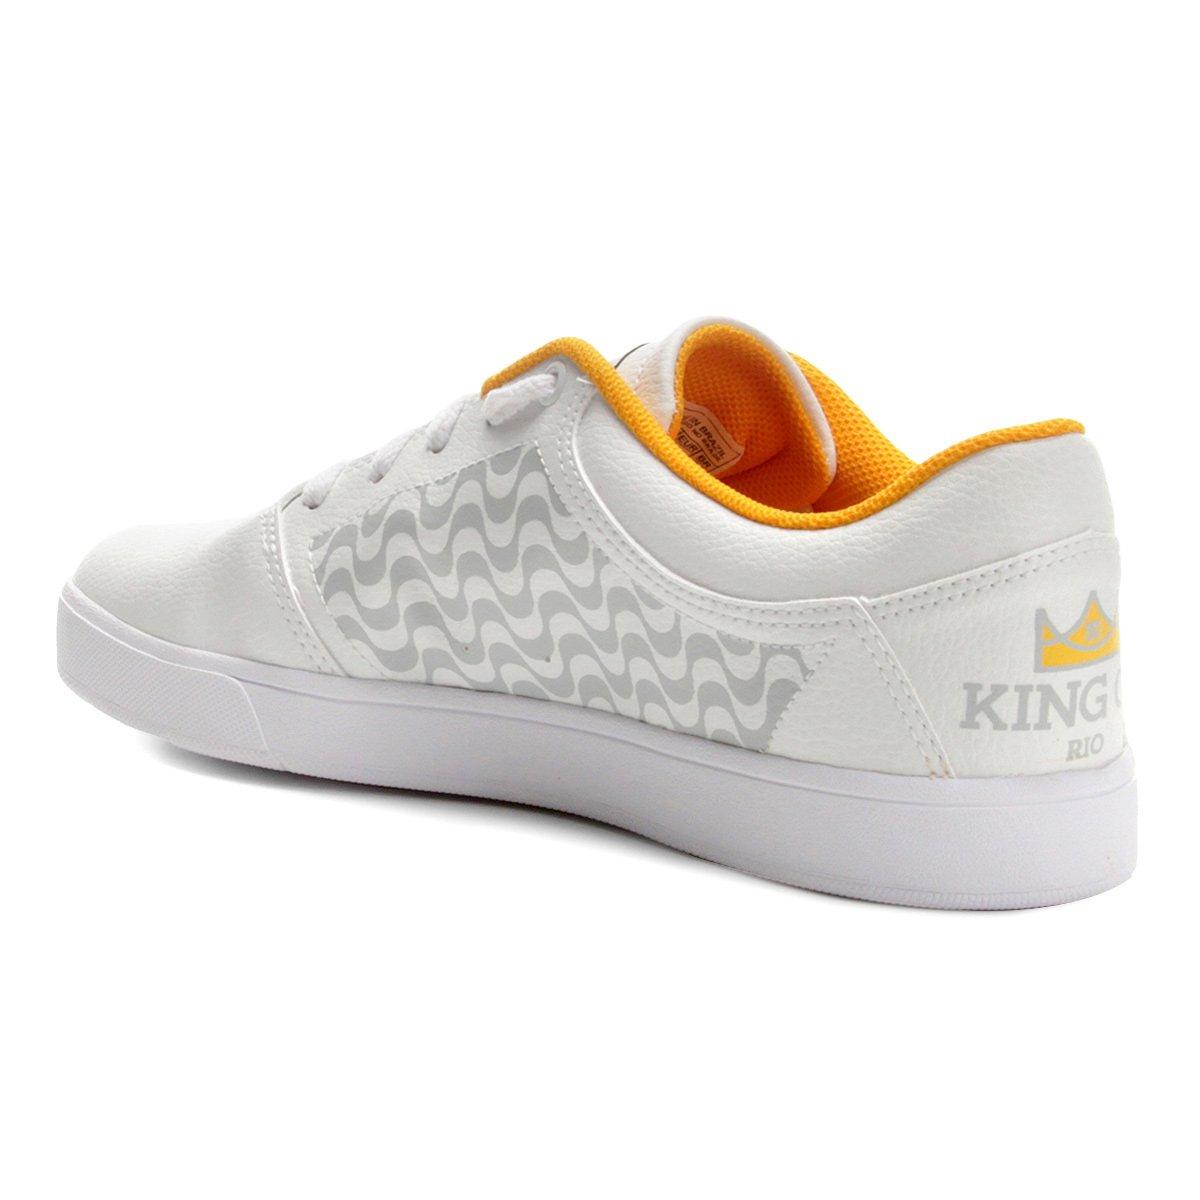 Rio Shoes Masculino DC Tênis King Of Crisis e dourado Branco Bq15S5wX